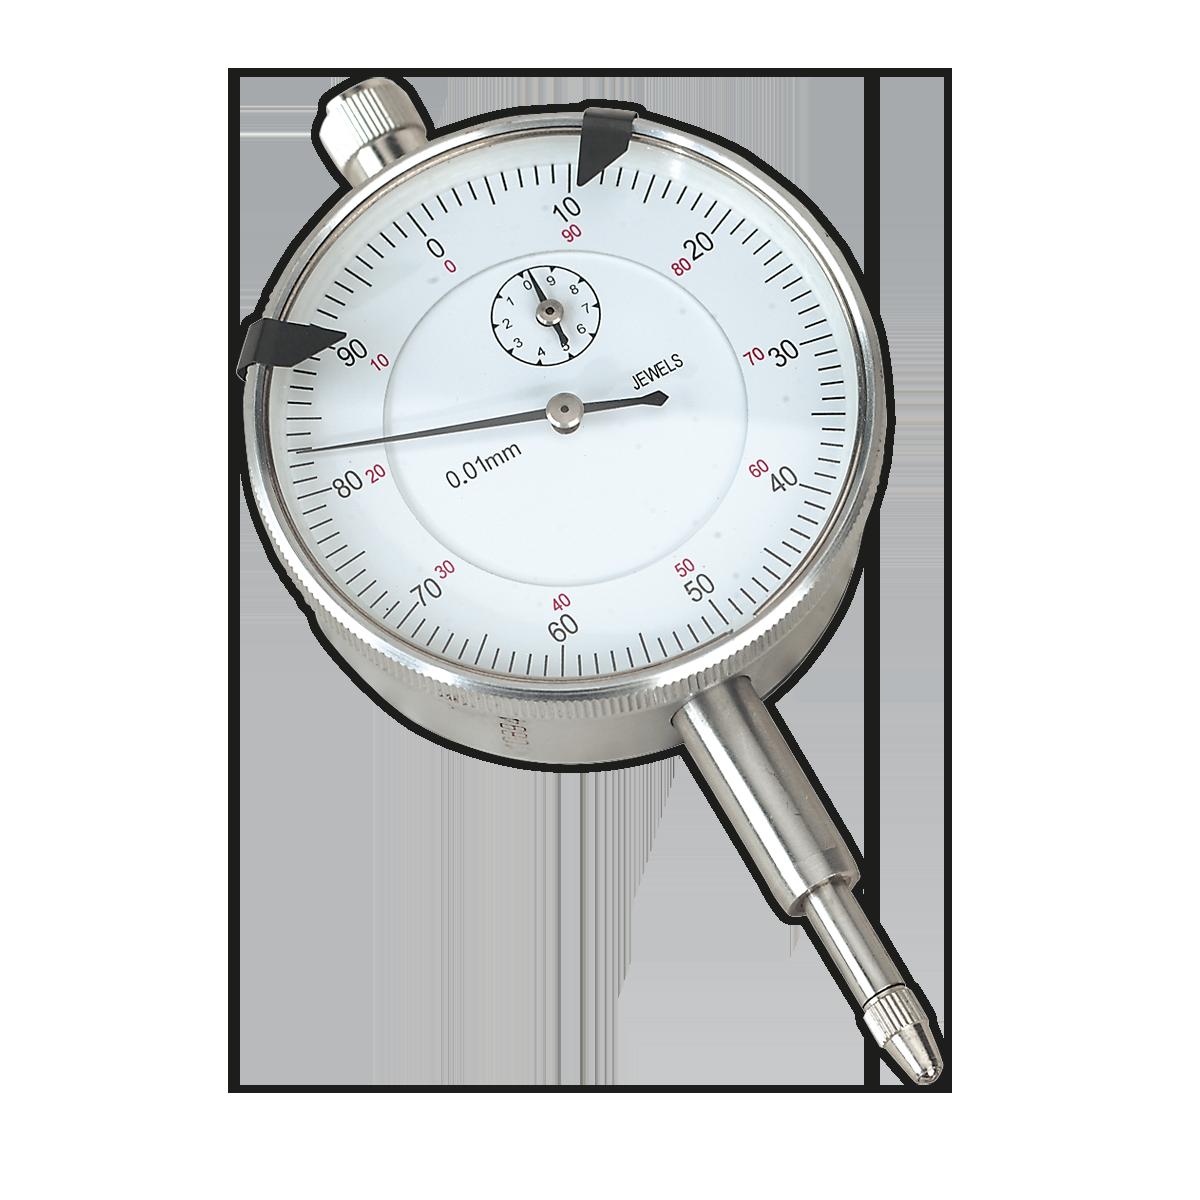 Dial Gauge Indicator 10mm Travel Metric